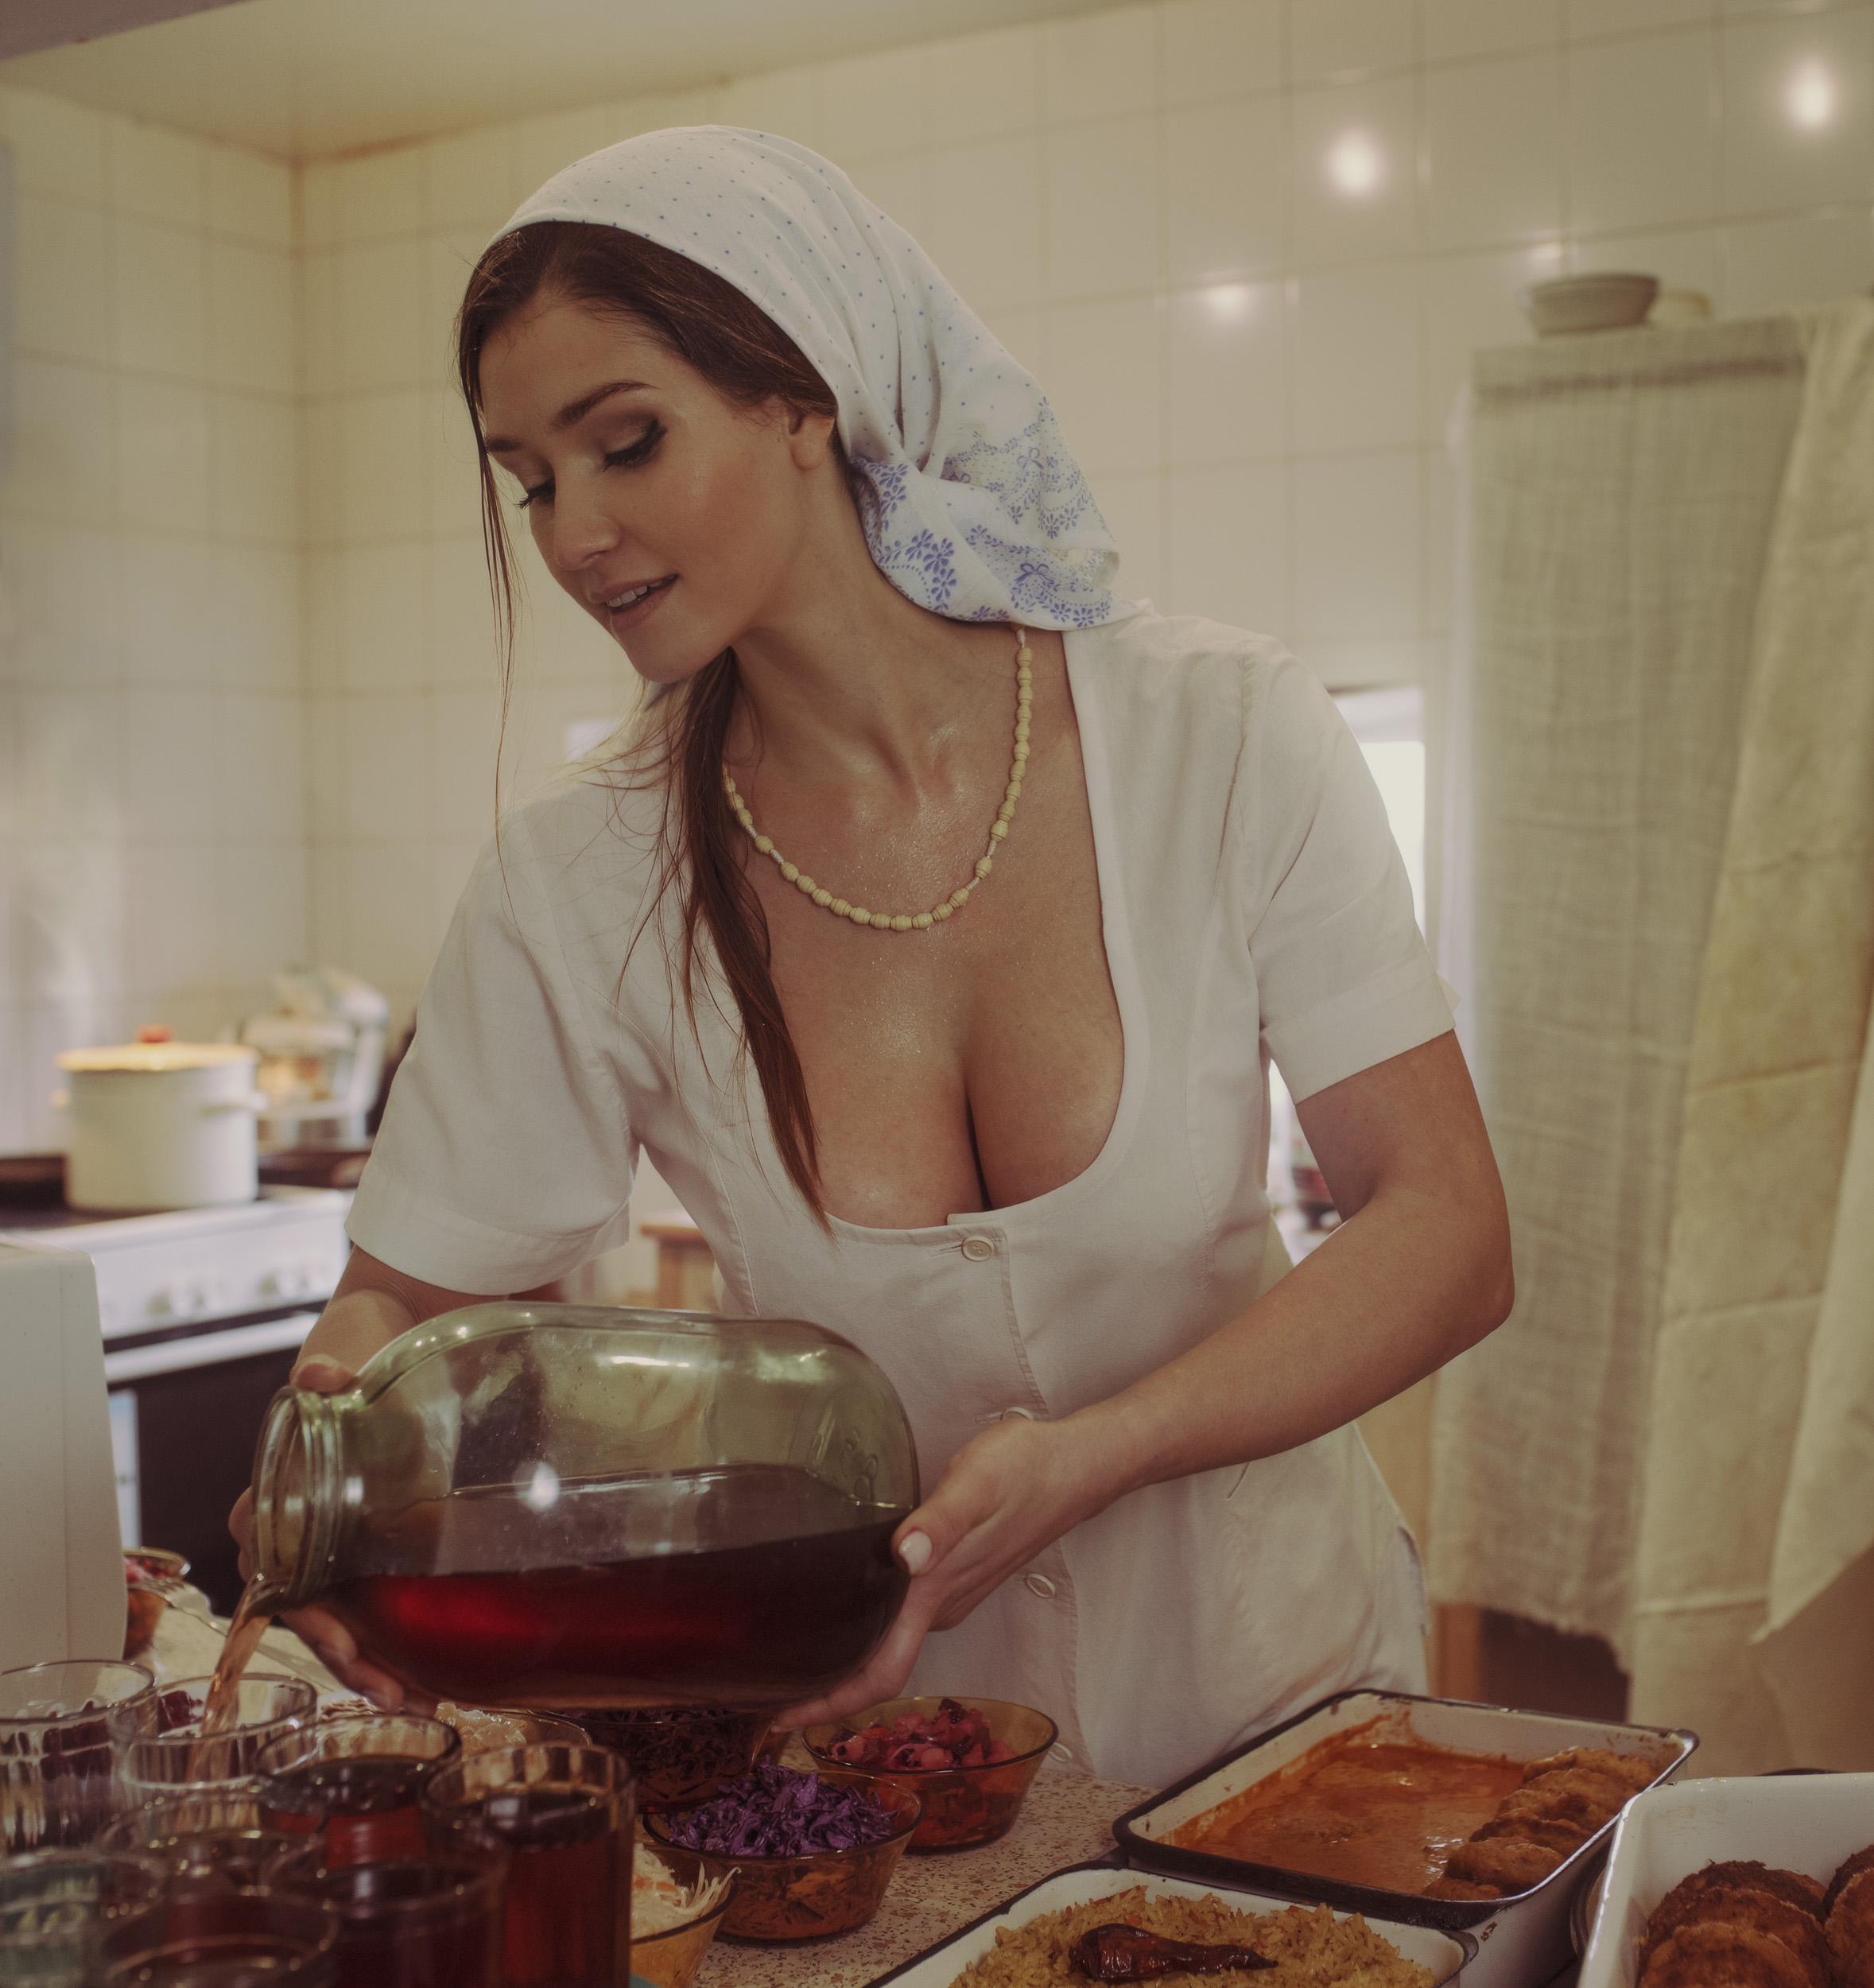 Приятного аппетита / фотограф Давид Дубницкий